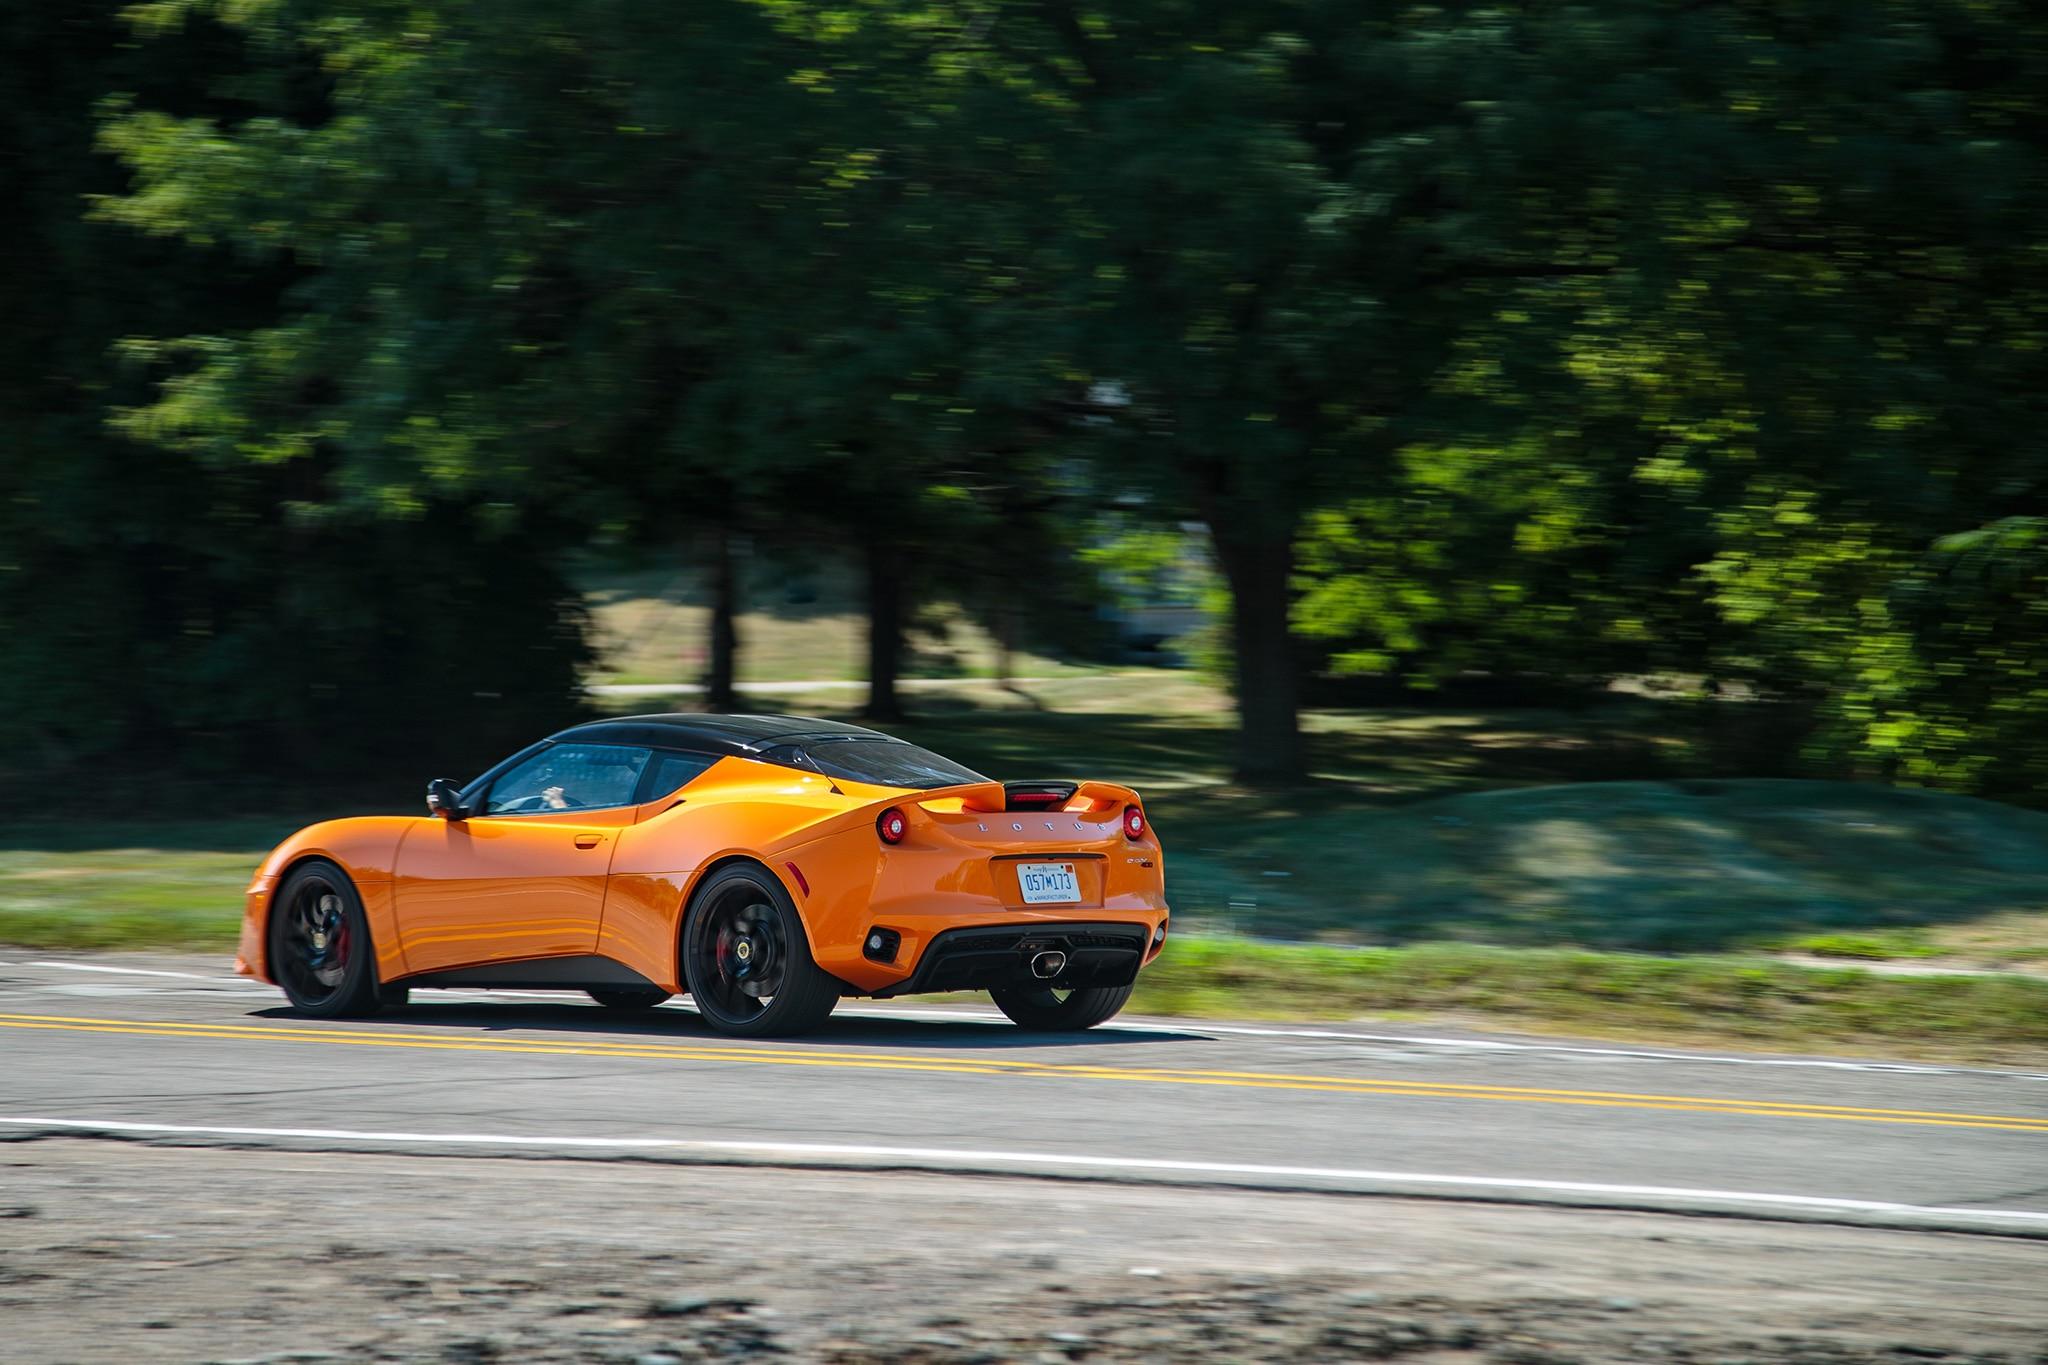 2017 Lotus Evora 400 Rear Three Quarter In Motion 10